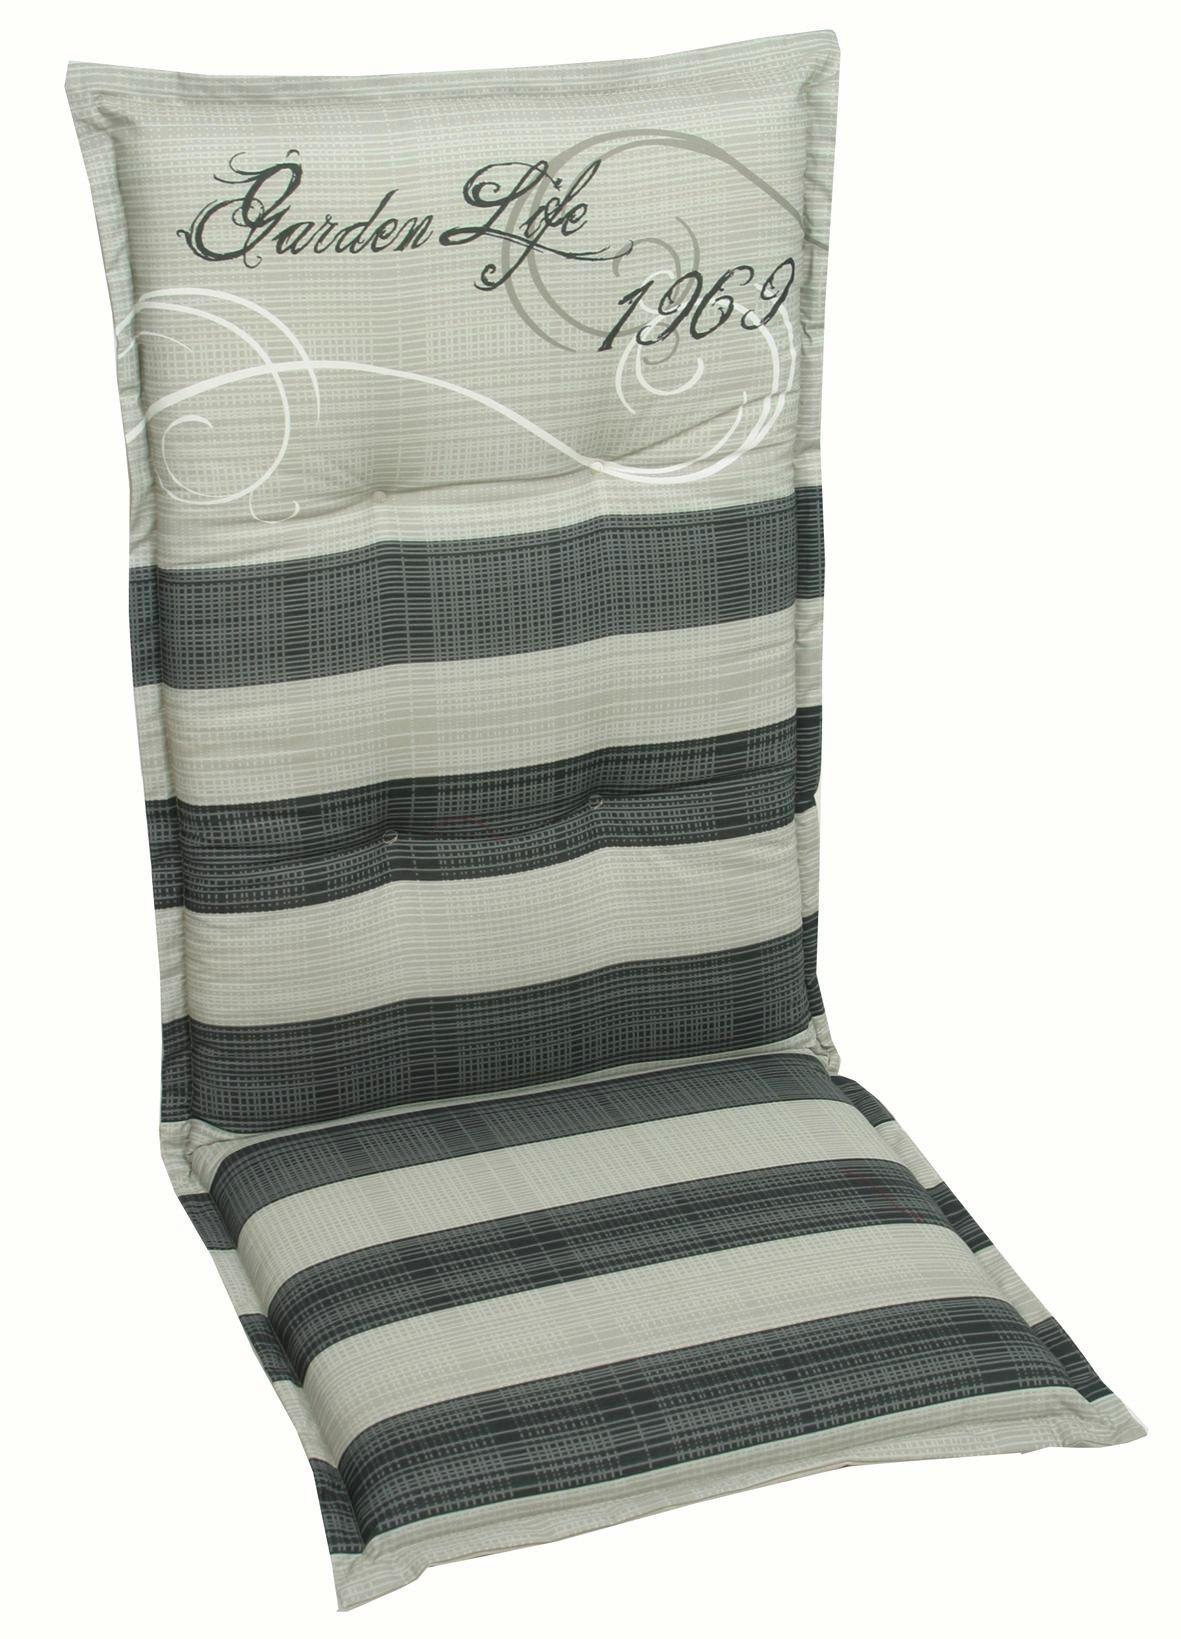 JASTUK ZA STOLICU - siva/antracit, Design, tekstil (50/120/8cm) - AMBIA GARDEN